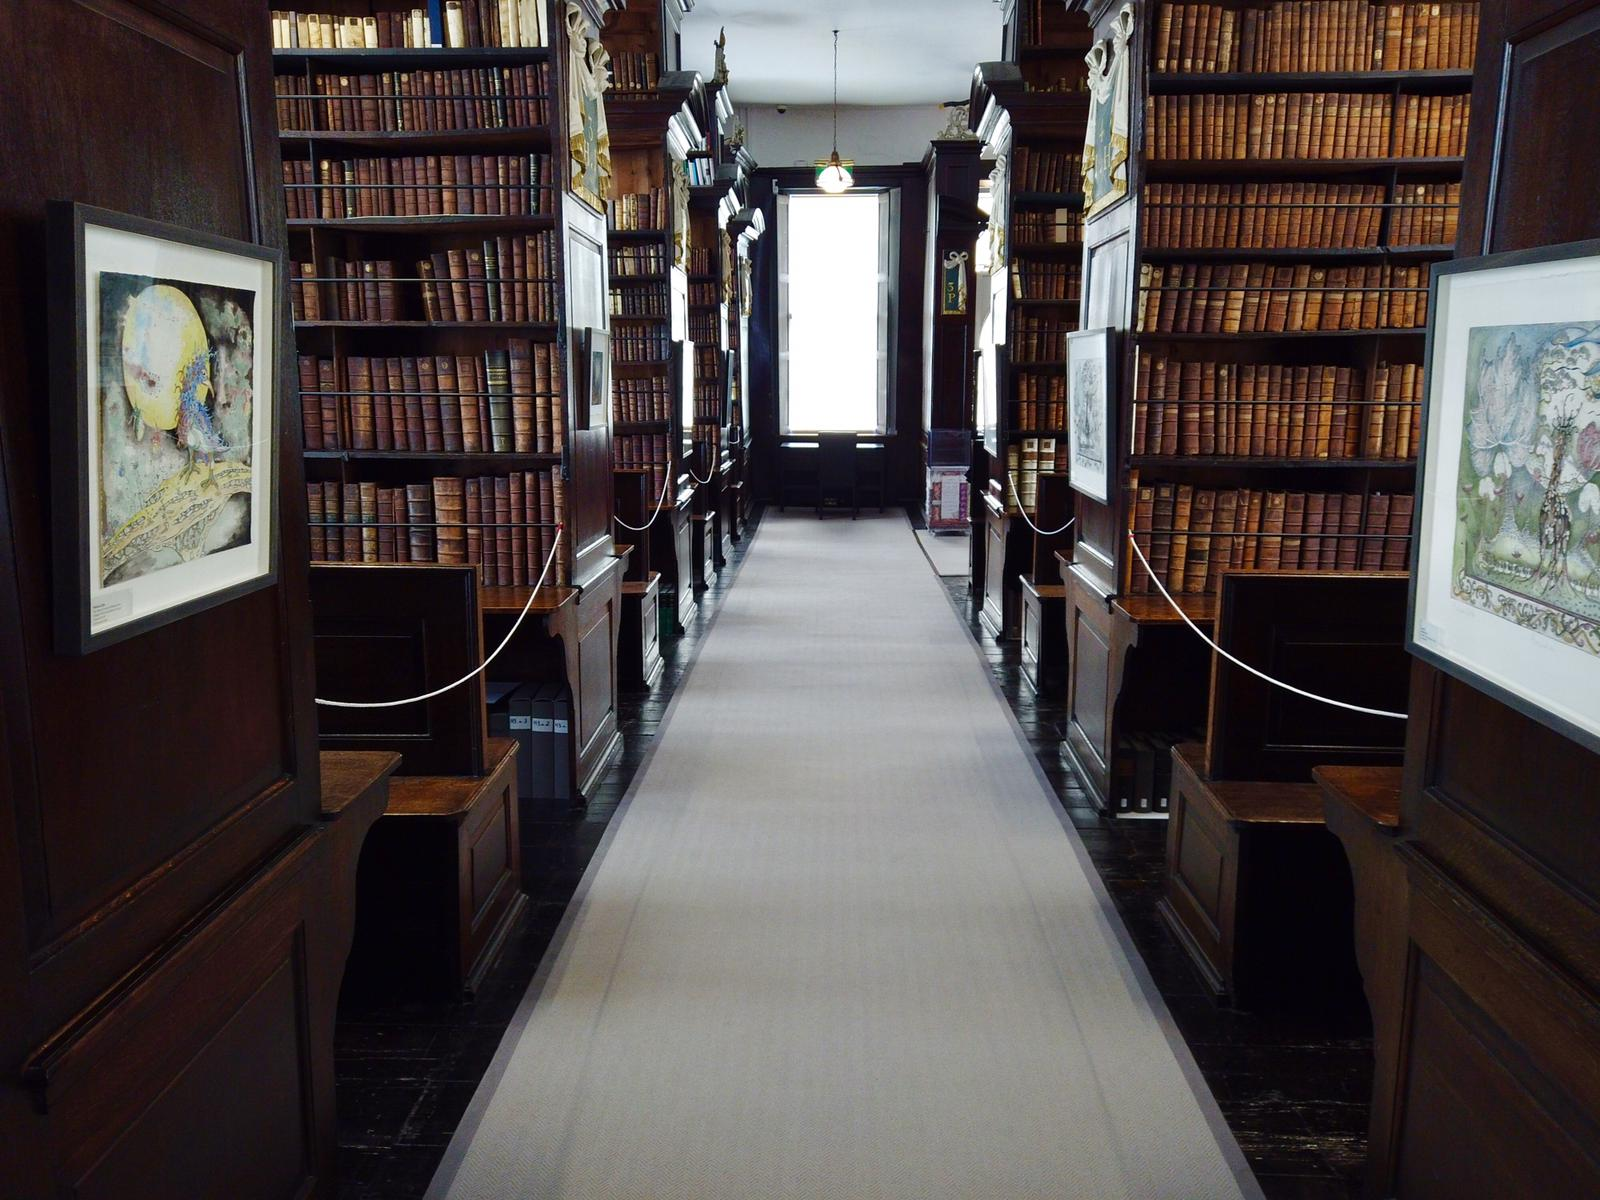 MARSH Library Dublino